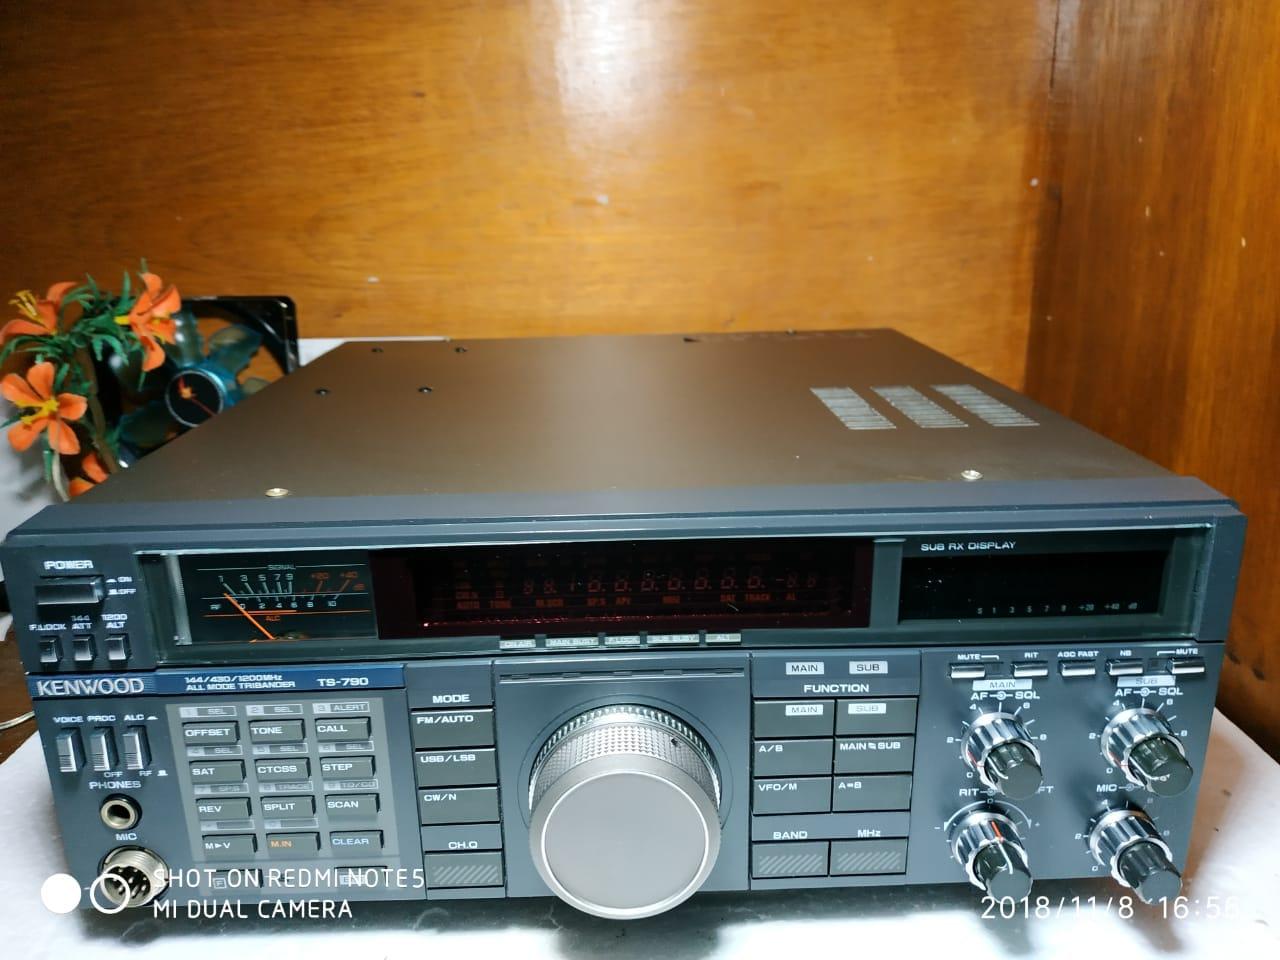 donys radio - Elektronik,radio komunikasi & assesoris HP